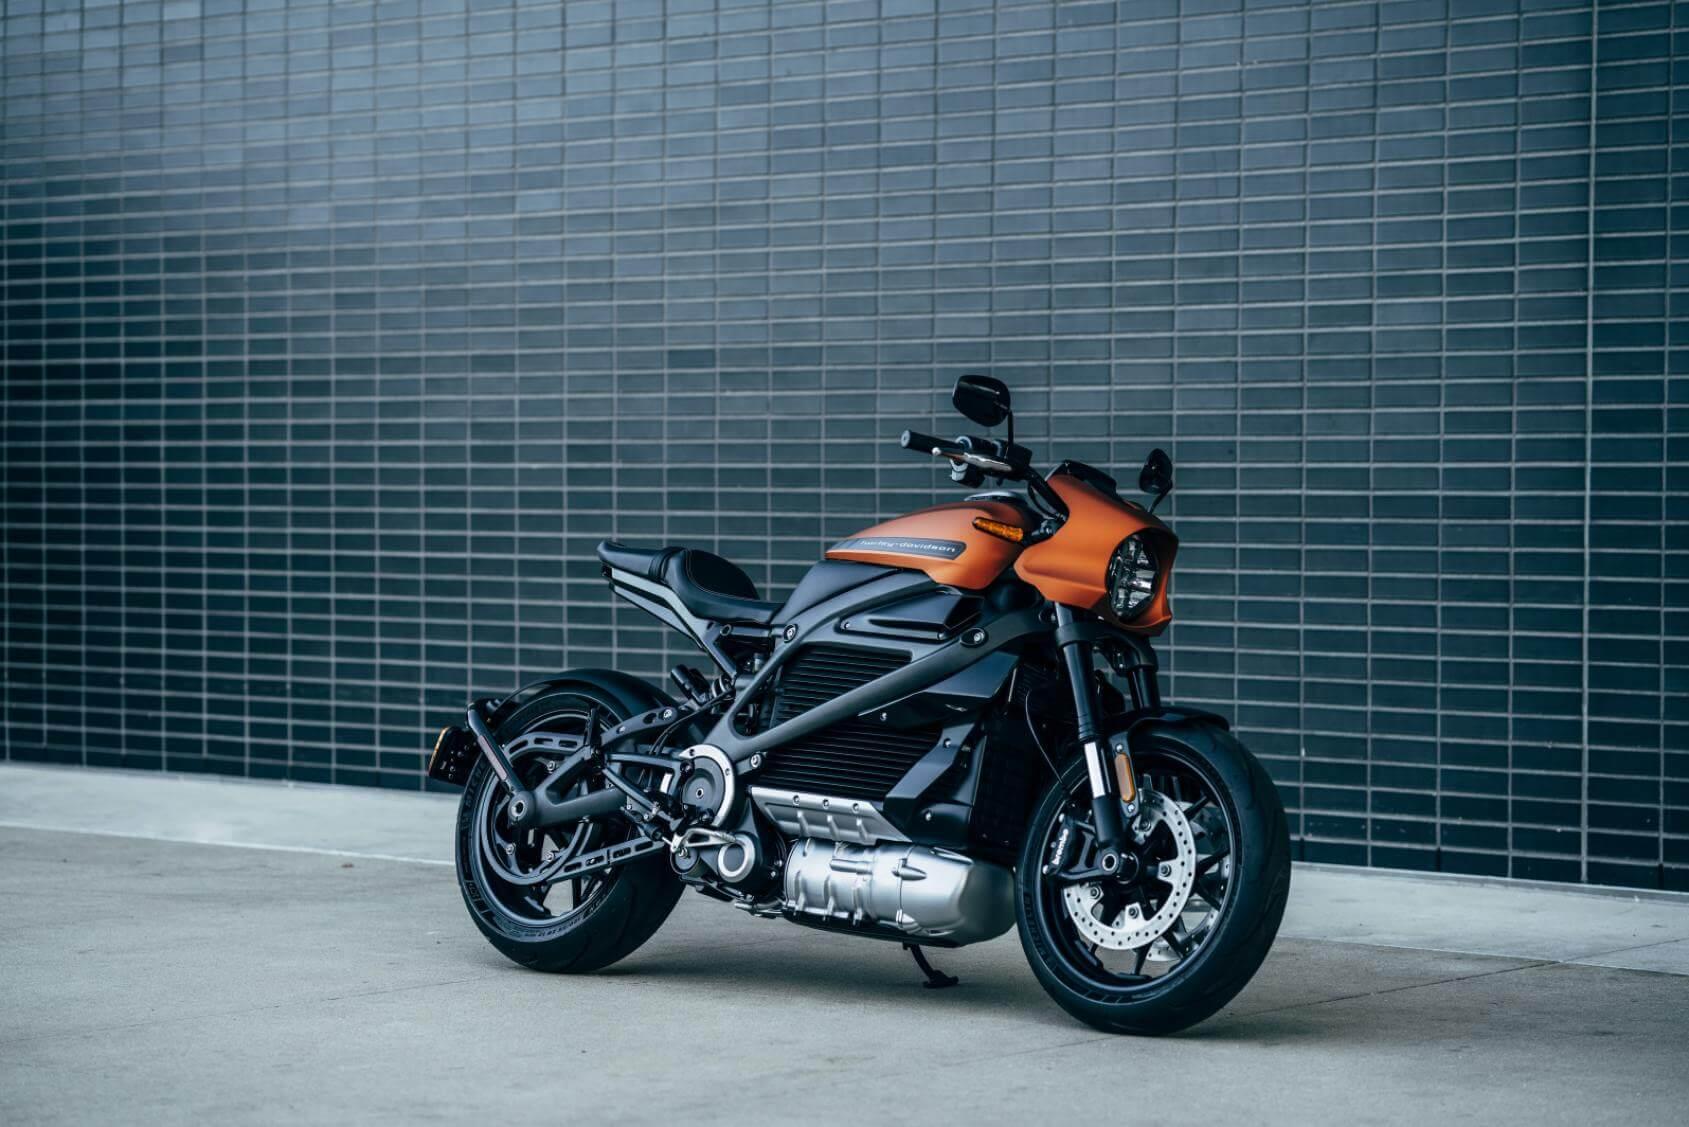 Harley Davidson Livewire - Original image